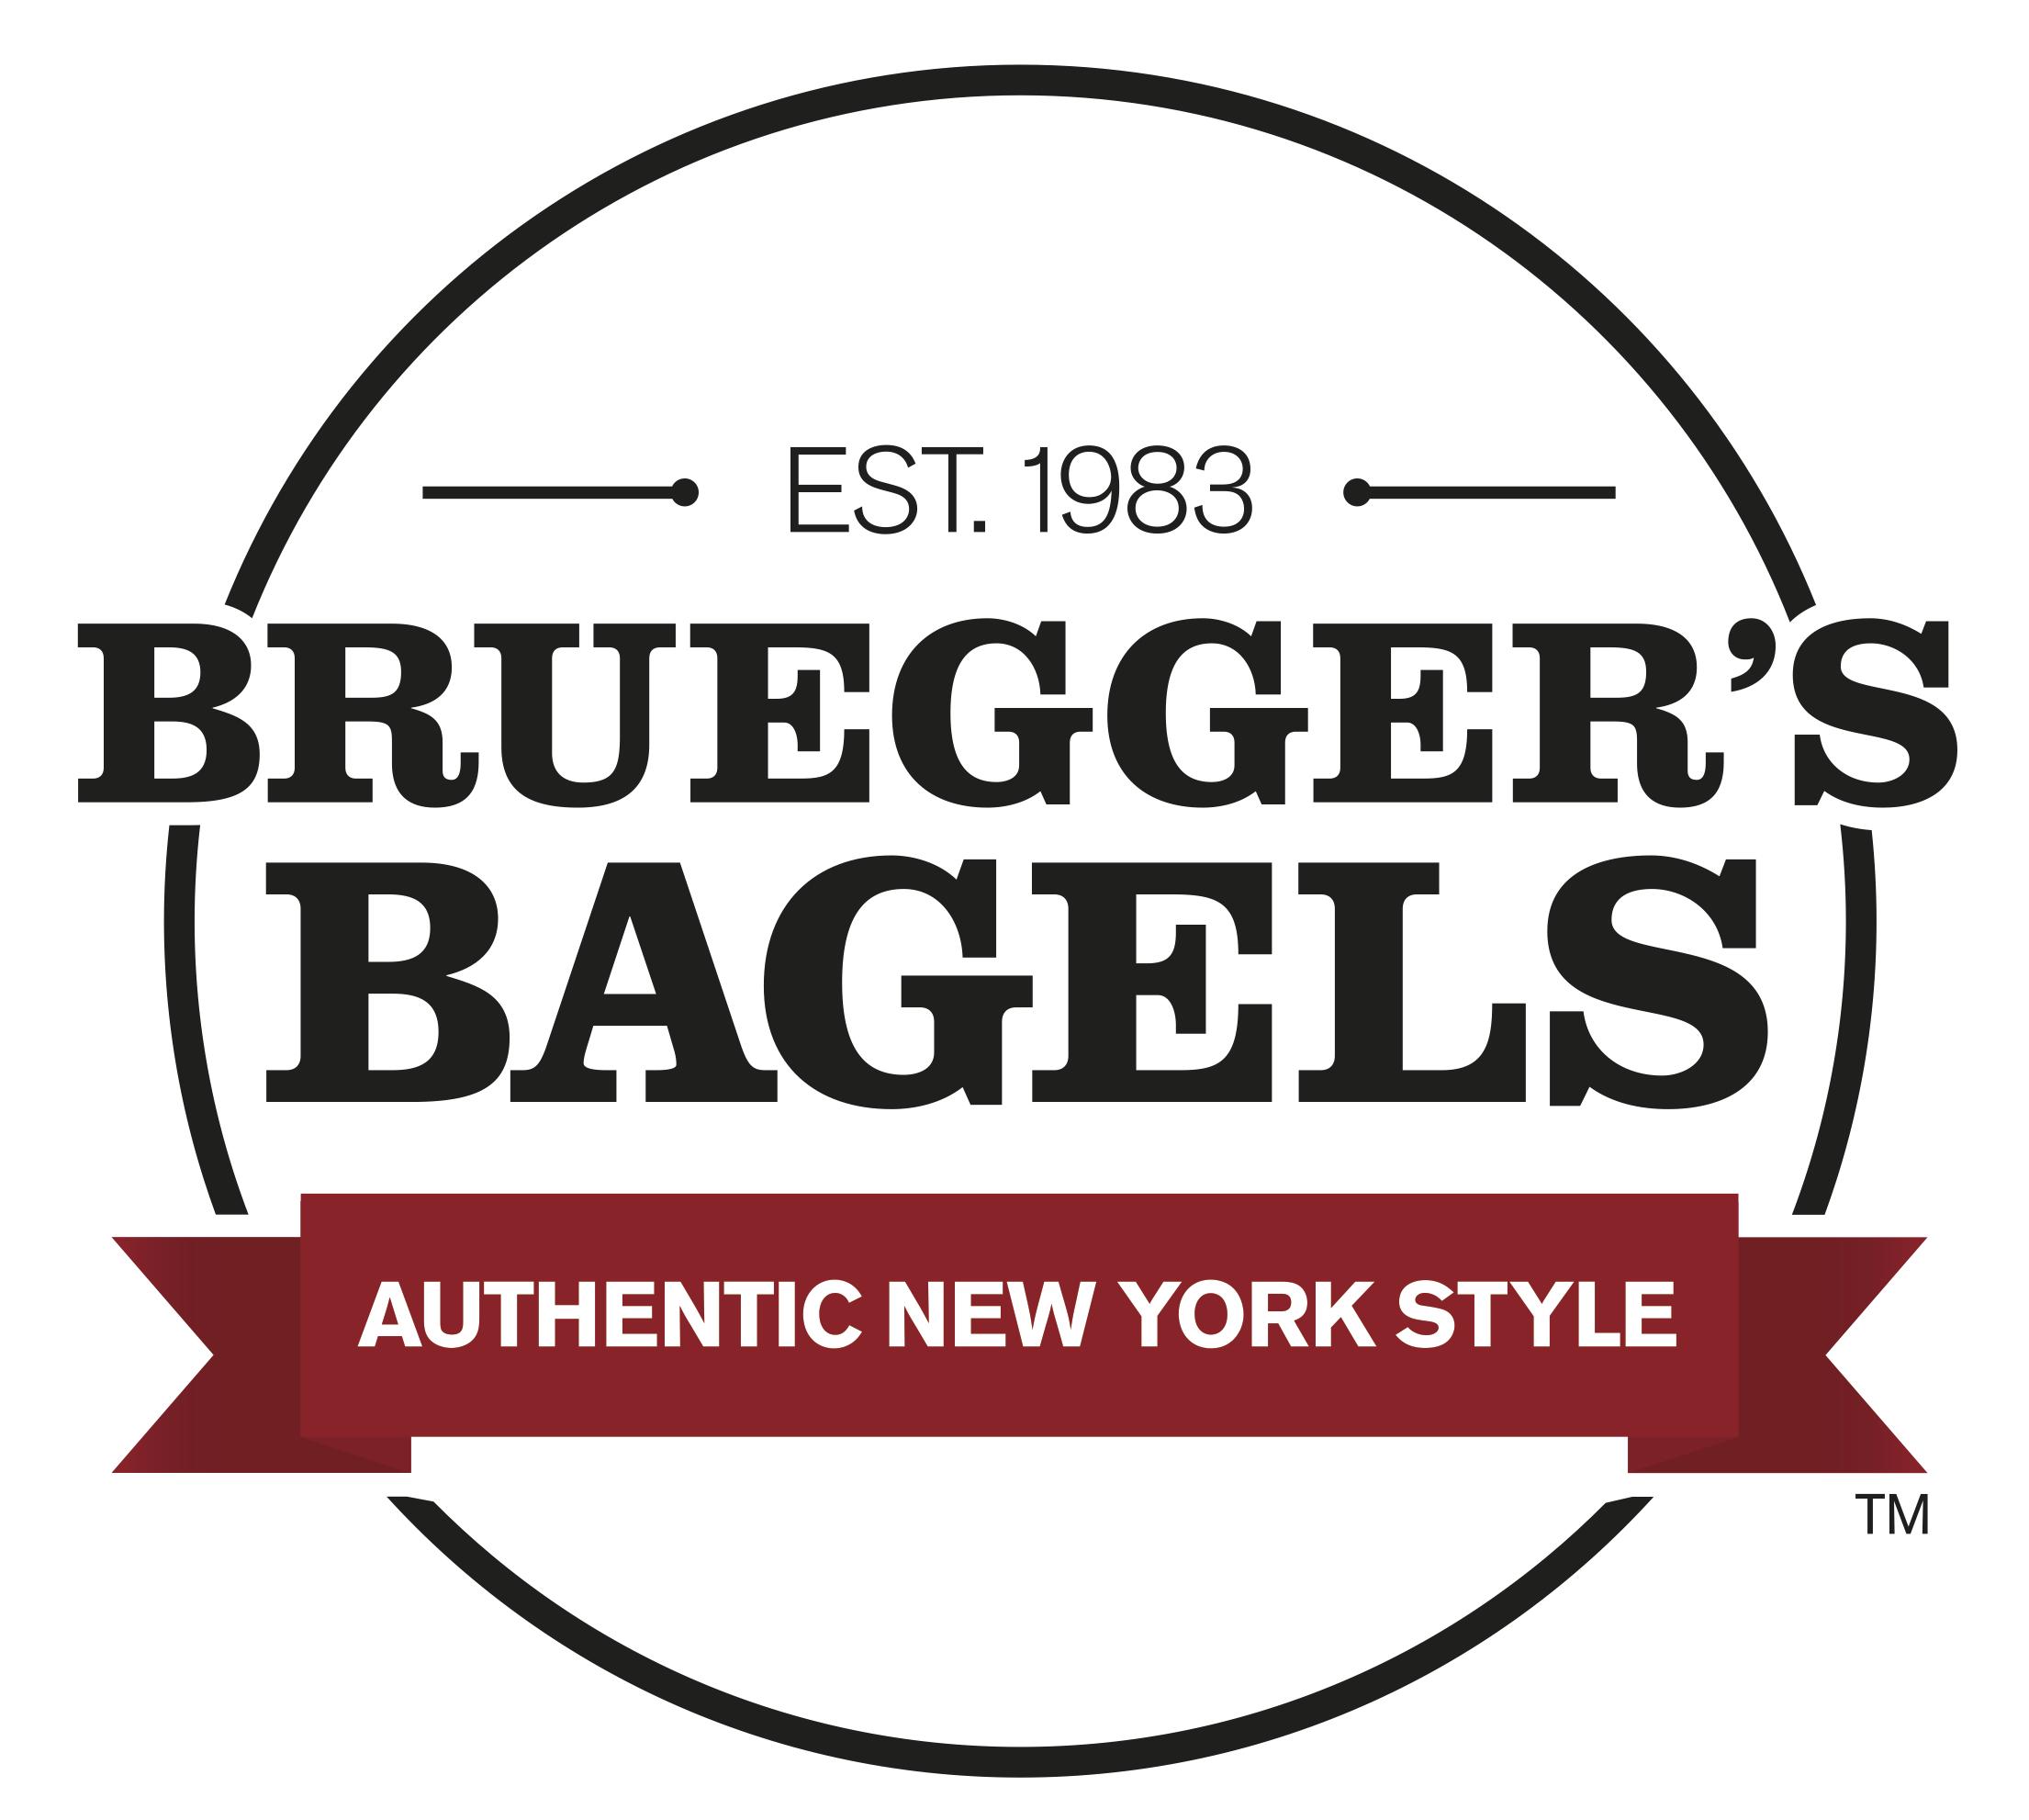 Breuggers